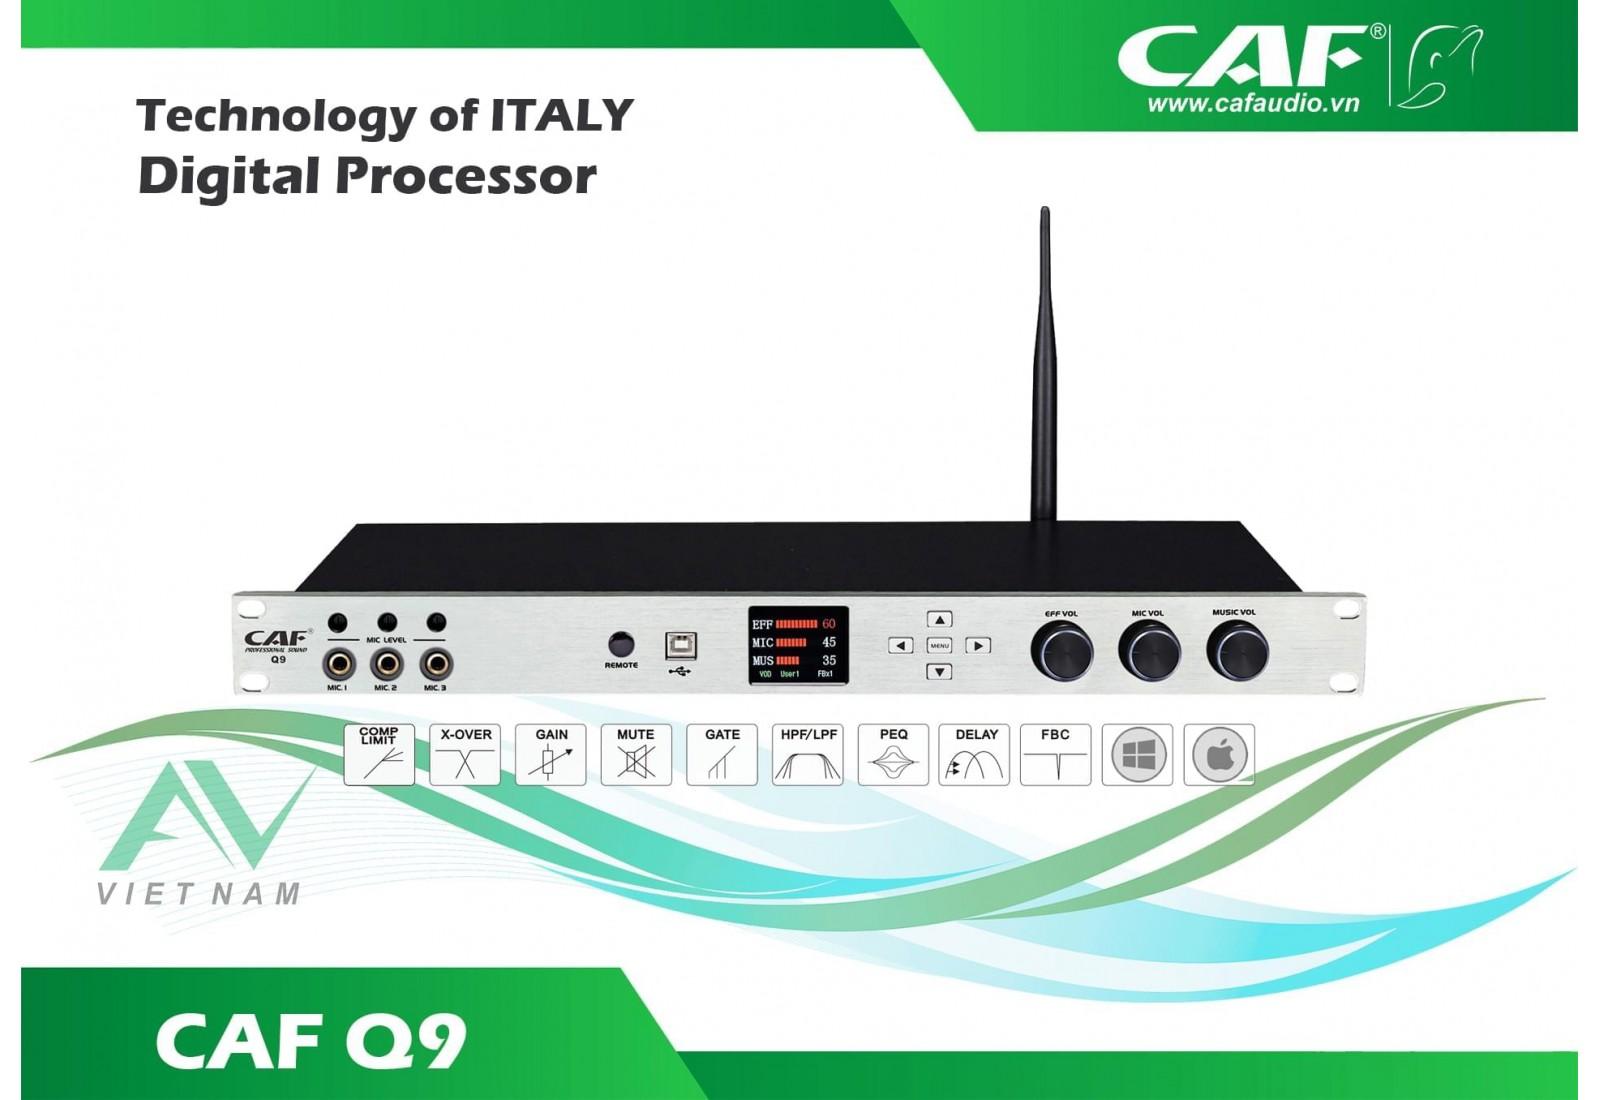 CAF Q9